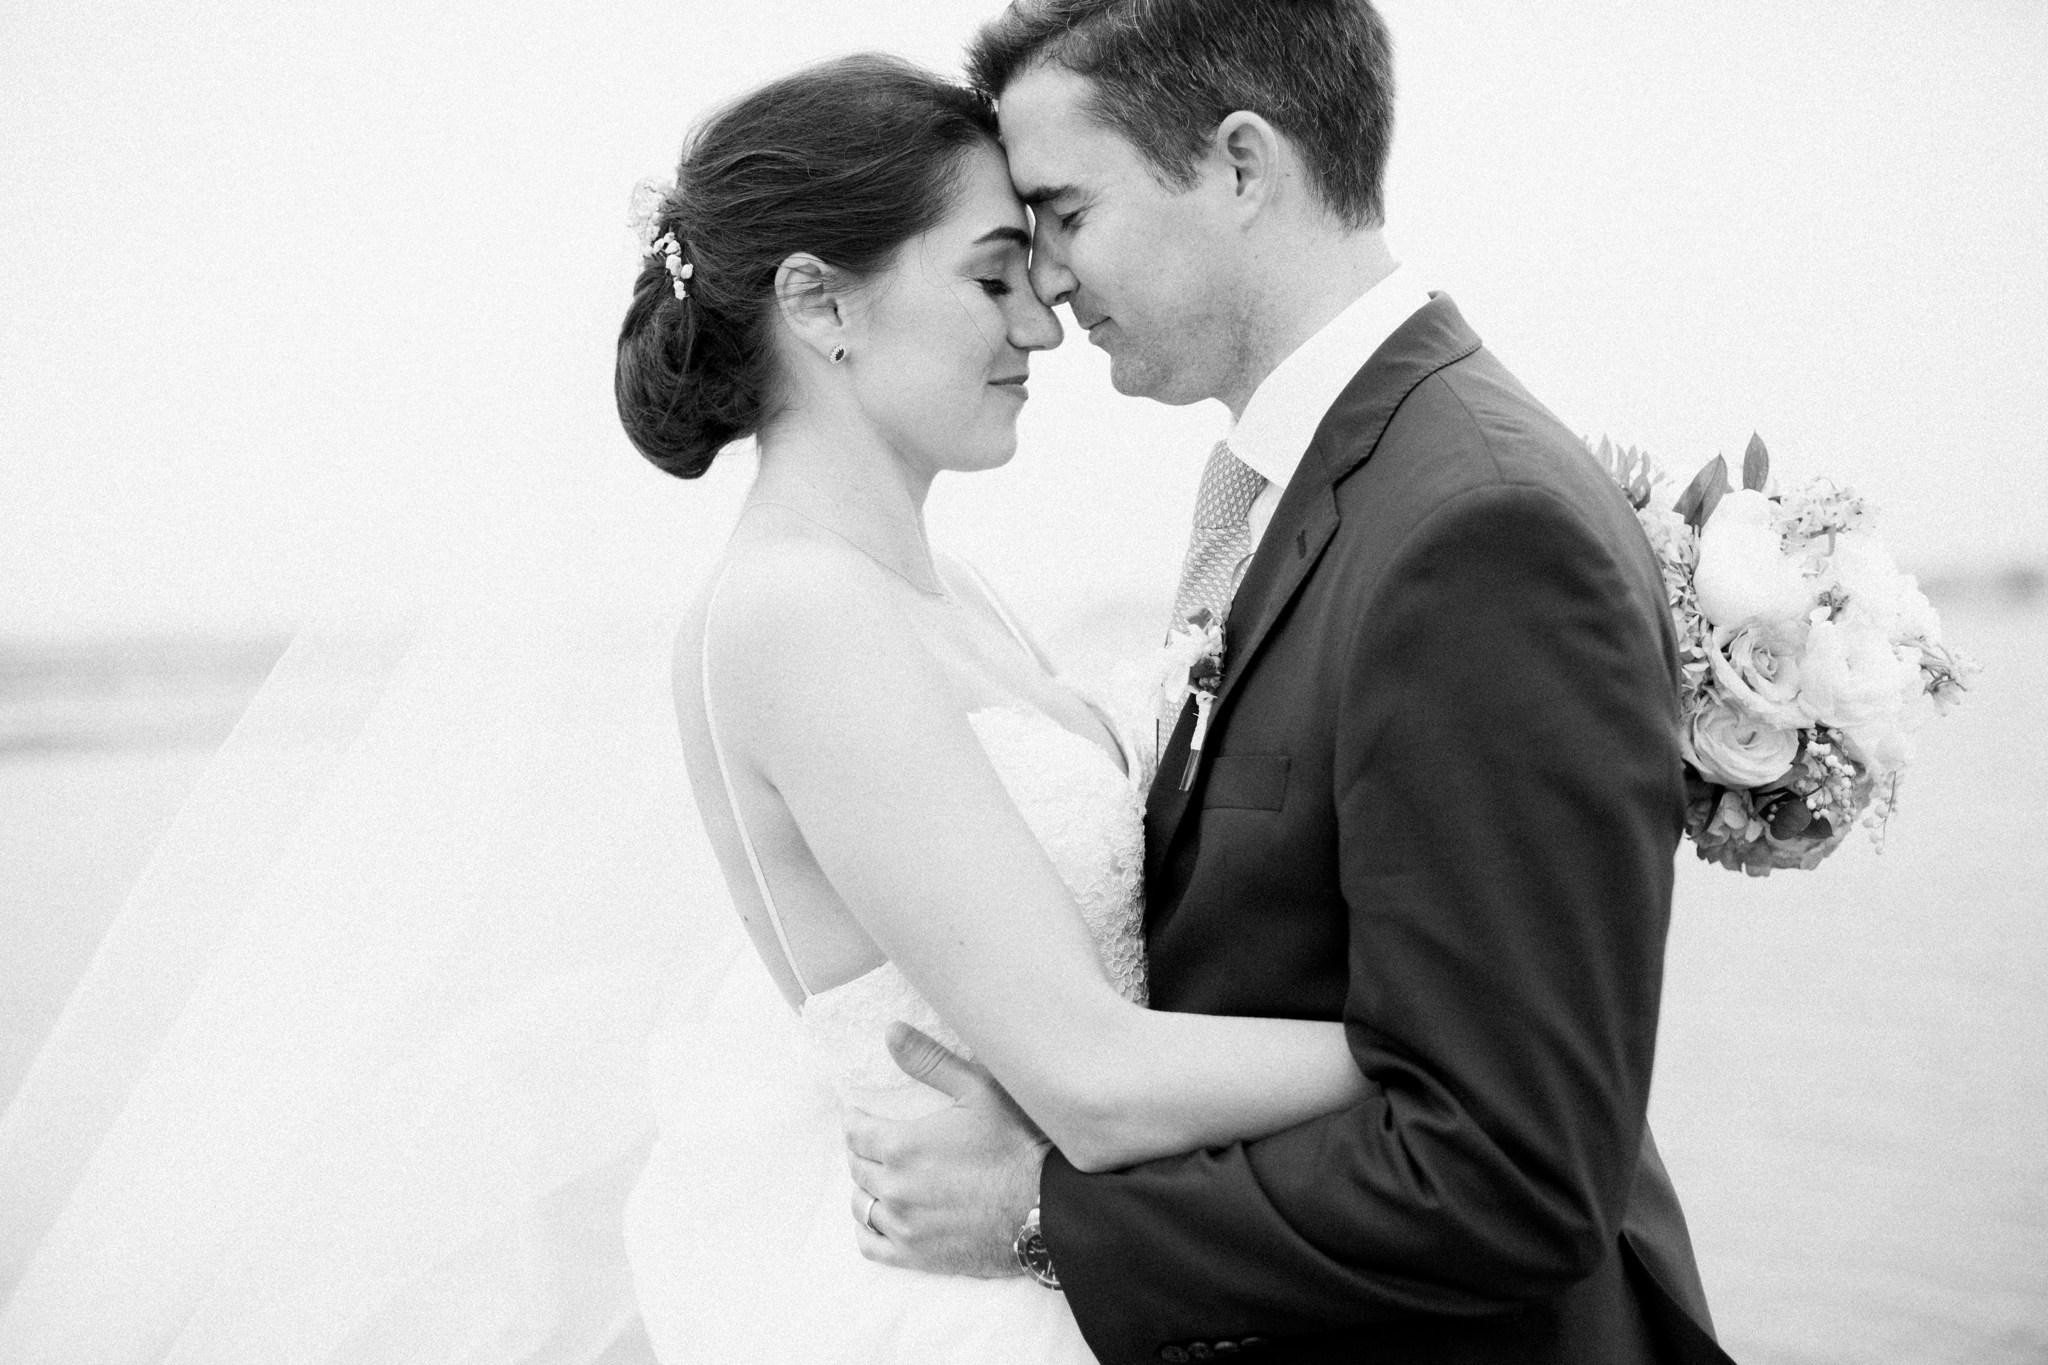 cape_cod_wedding_deborah_zoe_Photography_00063.JPG